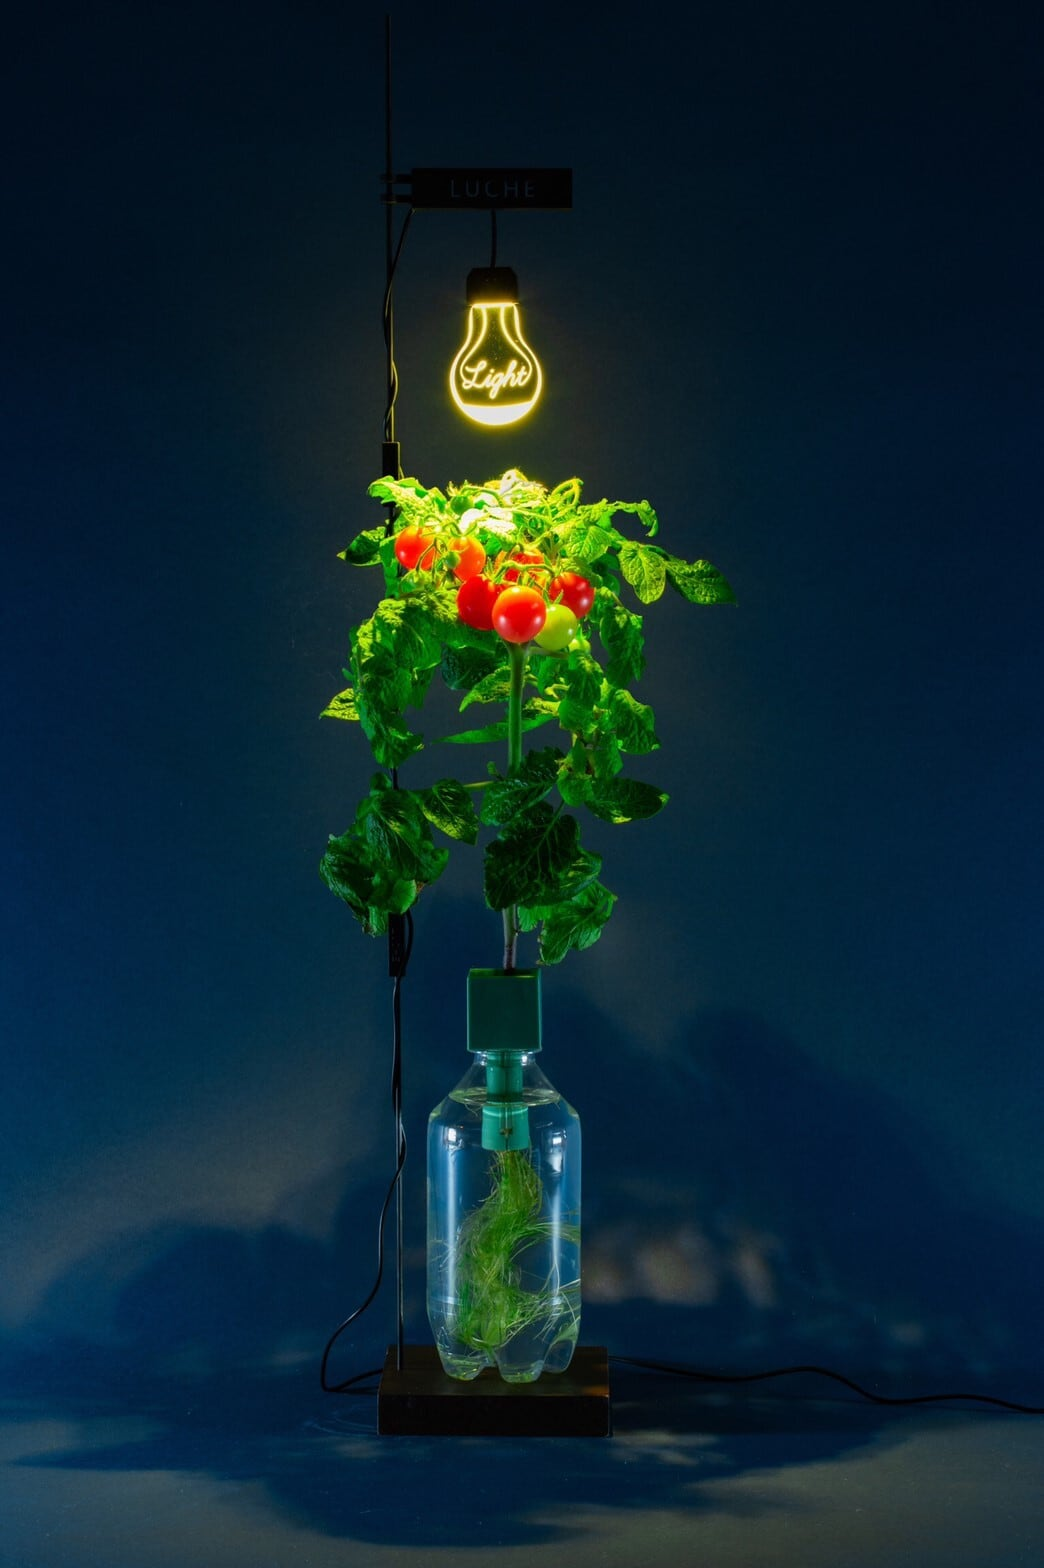 【Tomatoes - 栽培ライトなし】norm. original green grow kit